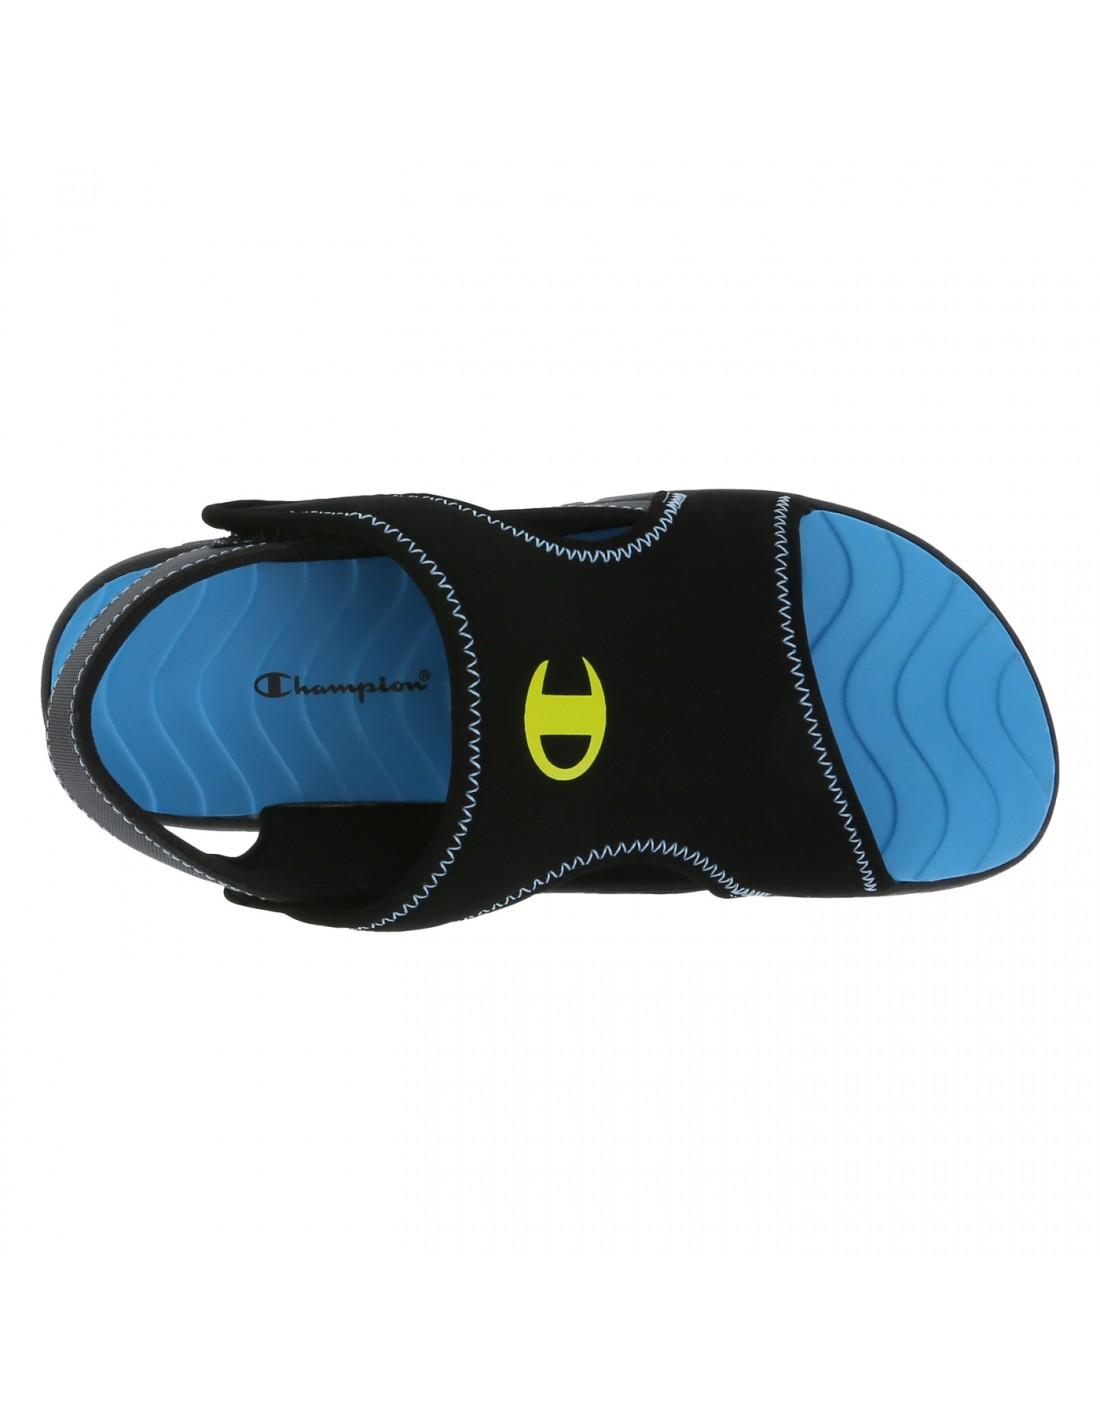 ed8fee5ba855 Boys  Toddler Splash Sandals. Next